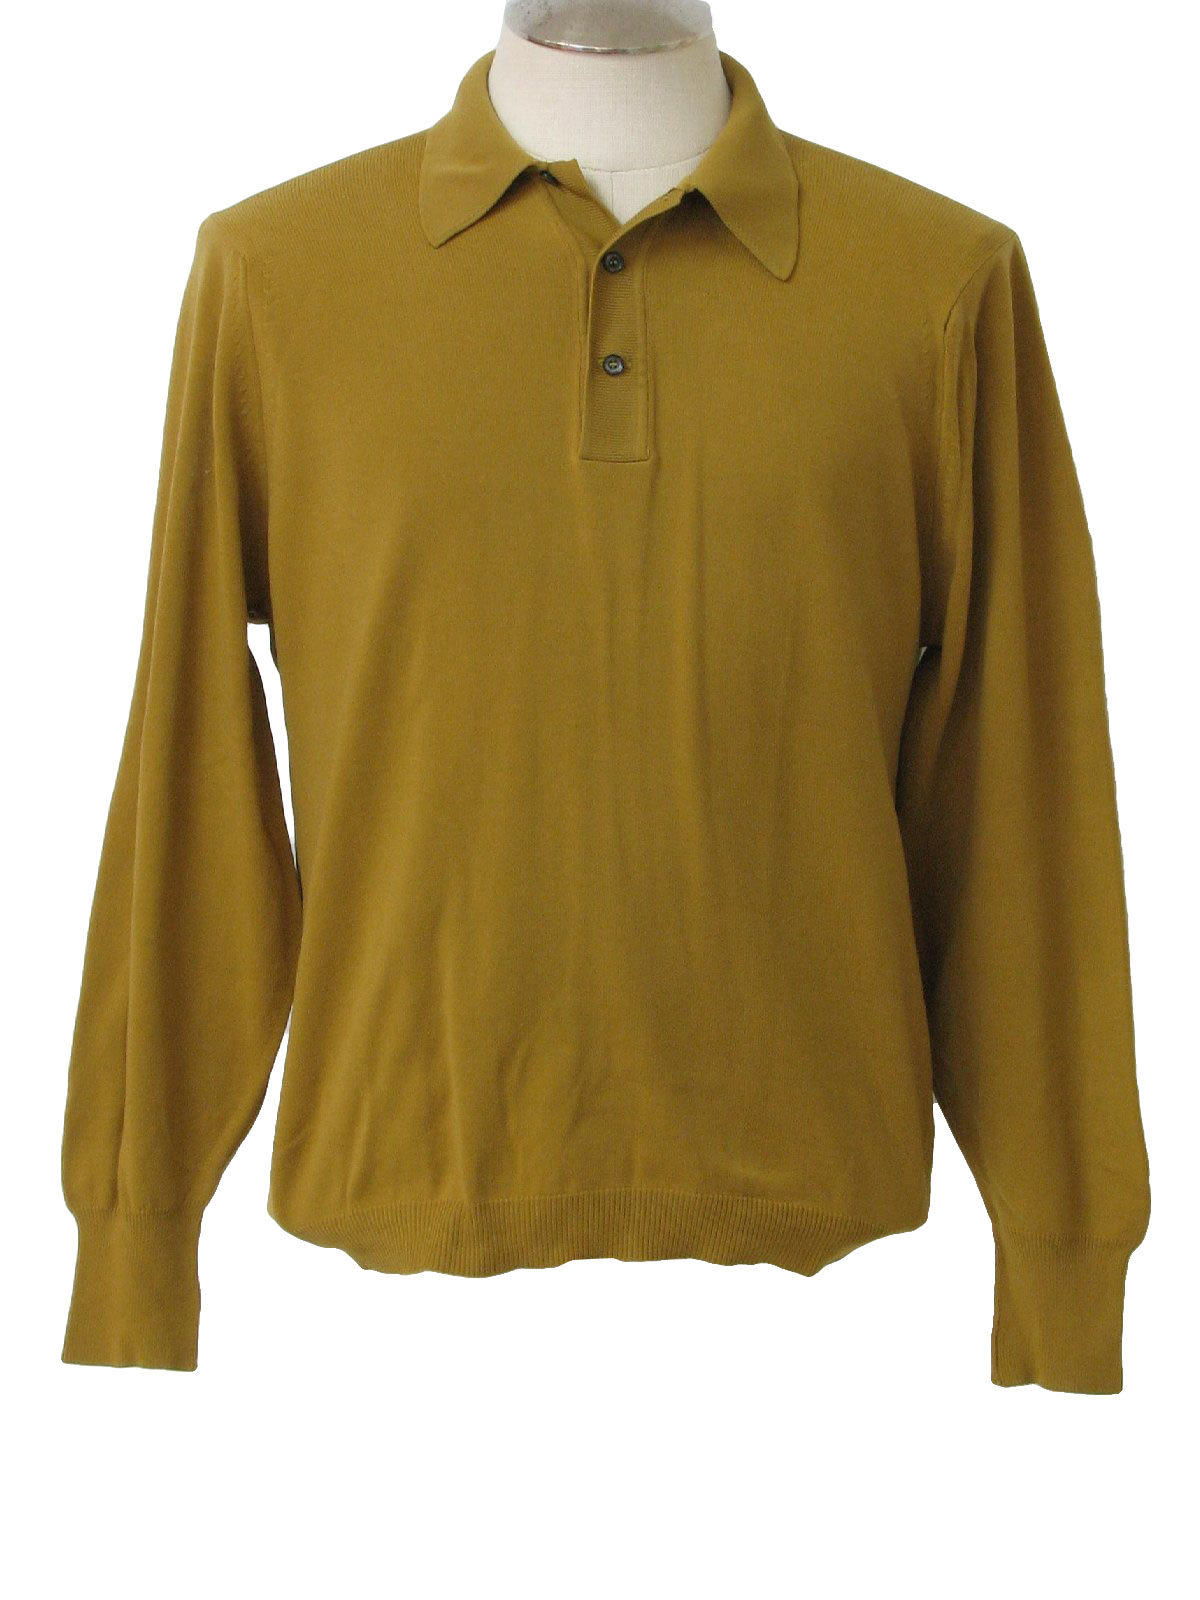 Retro Sixties Shirt Late 60s No Label Mens Tan Nylon